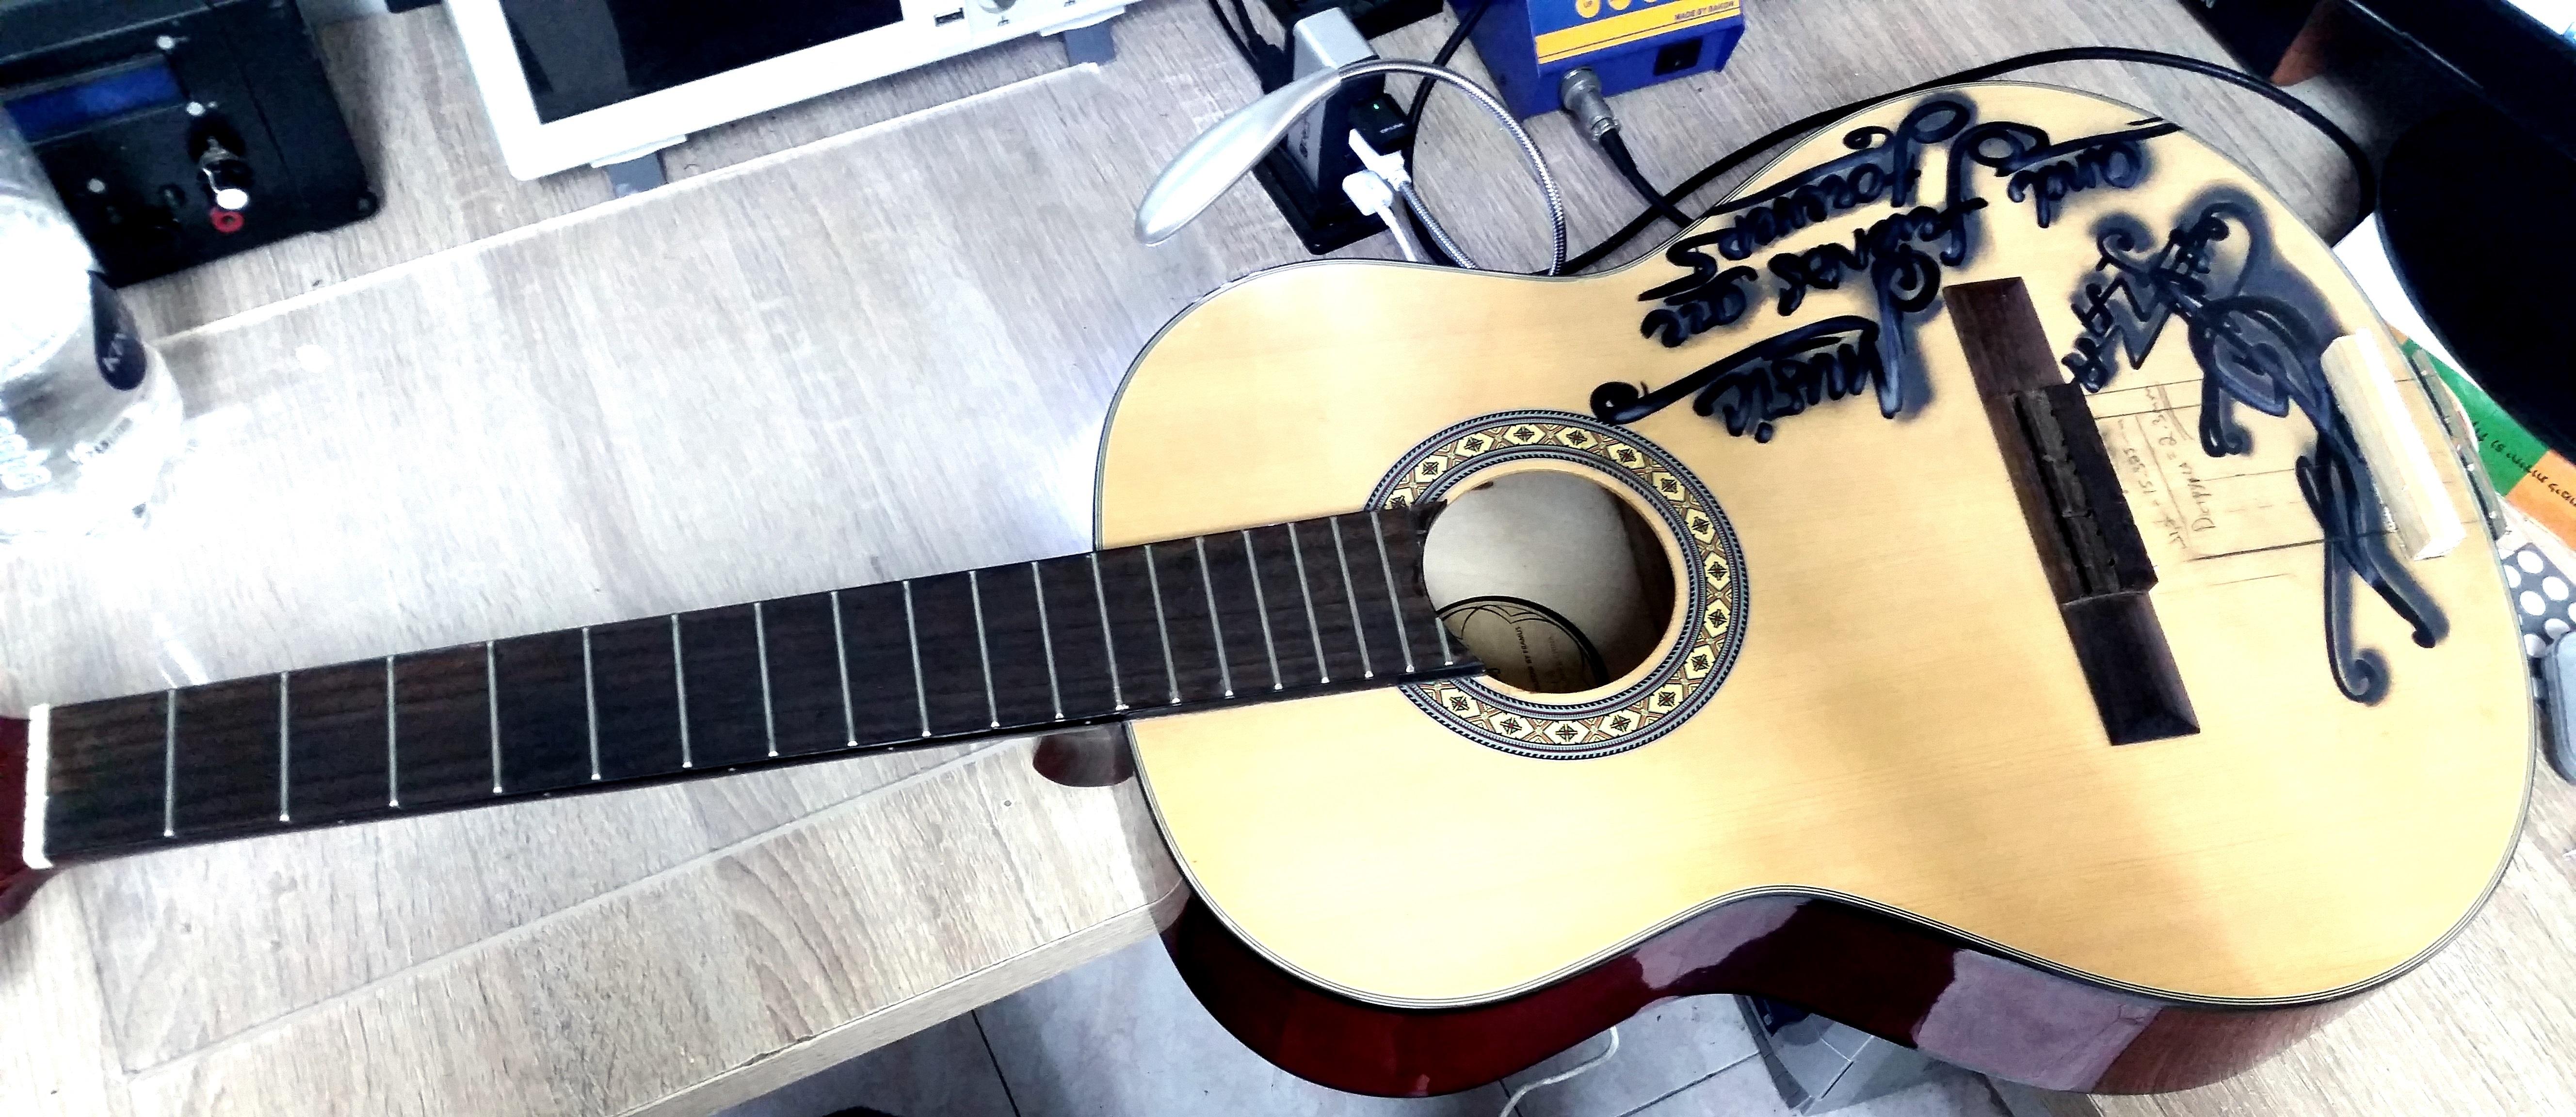 Picture of Guitar Preparing